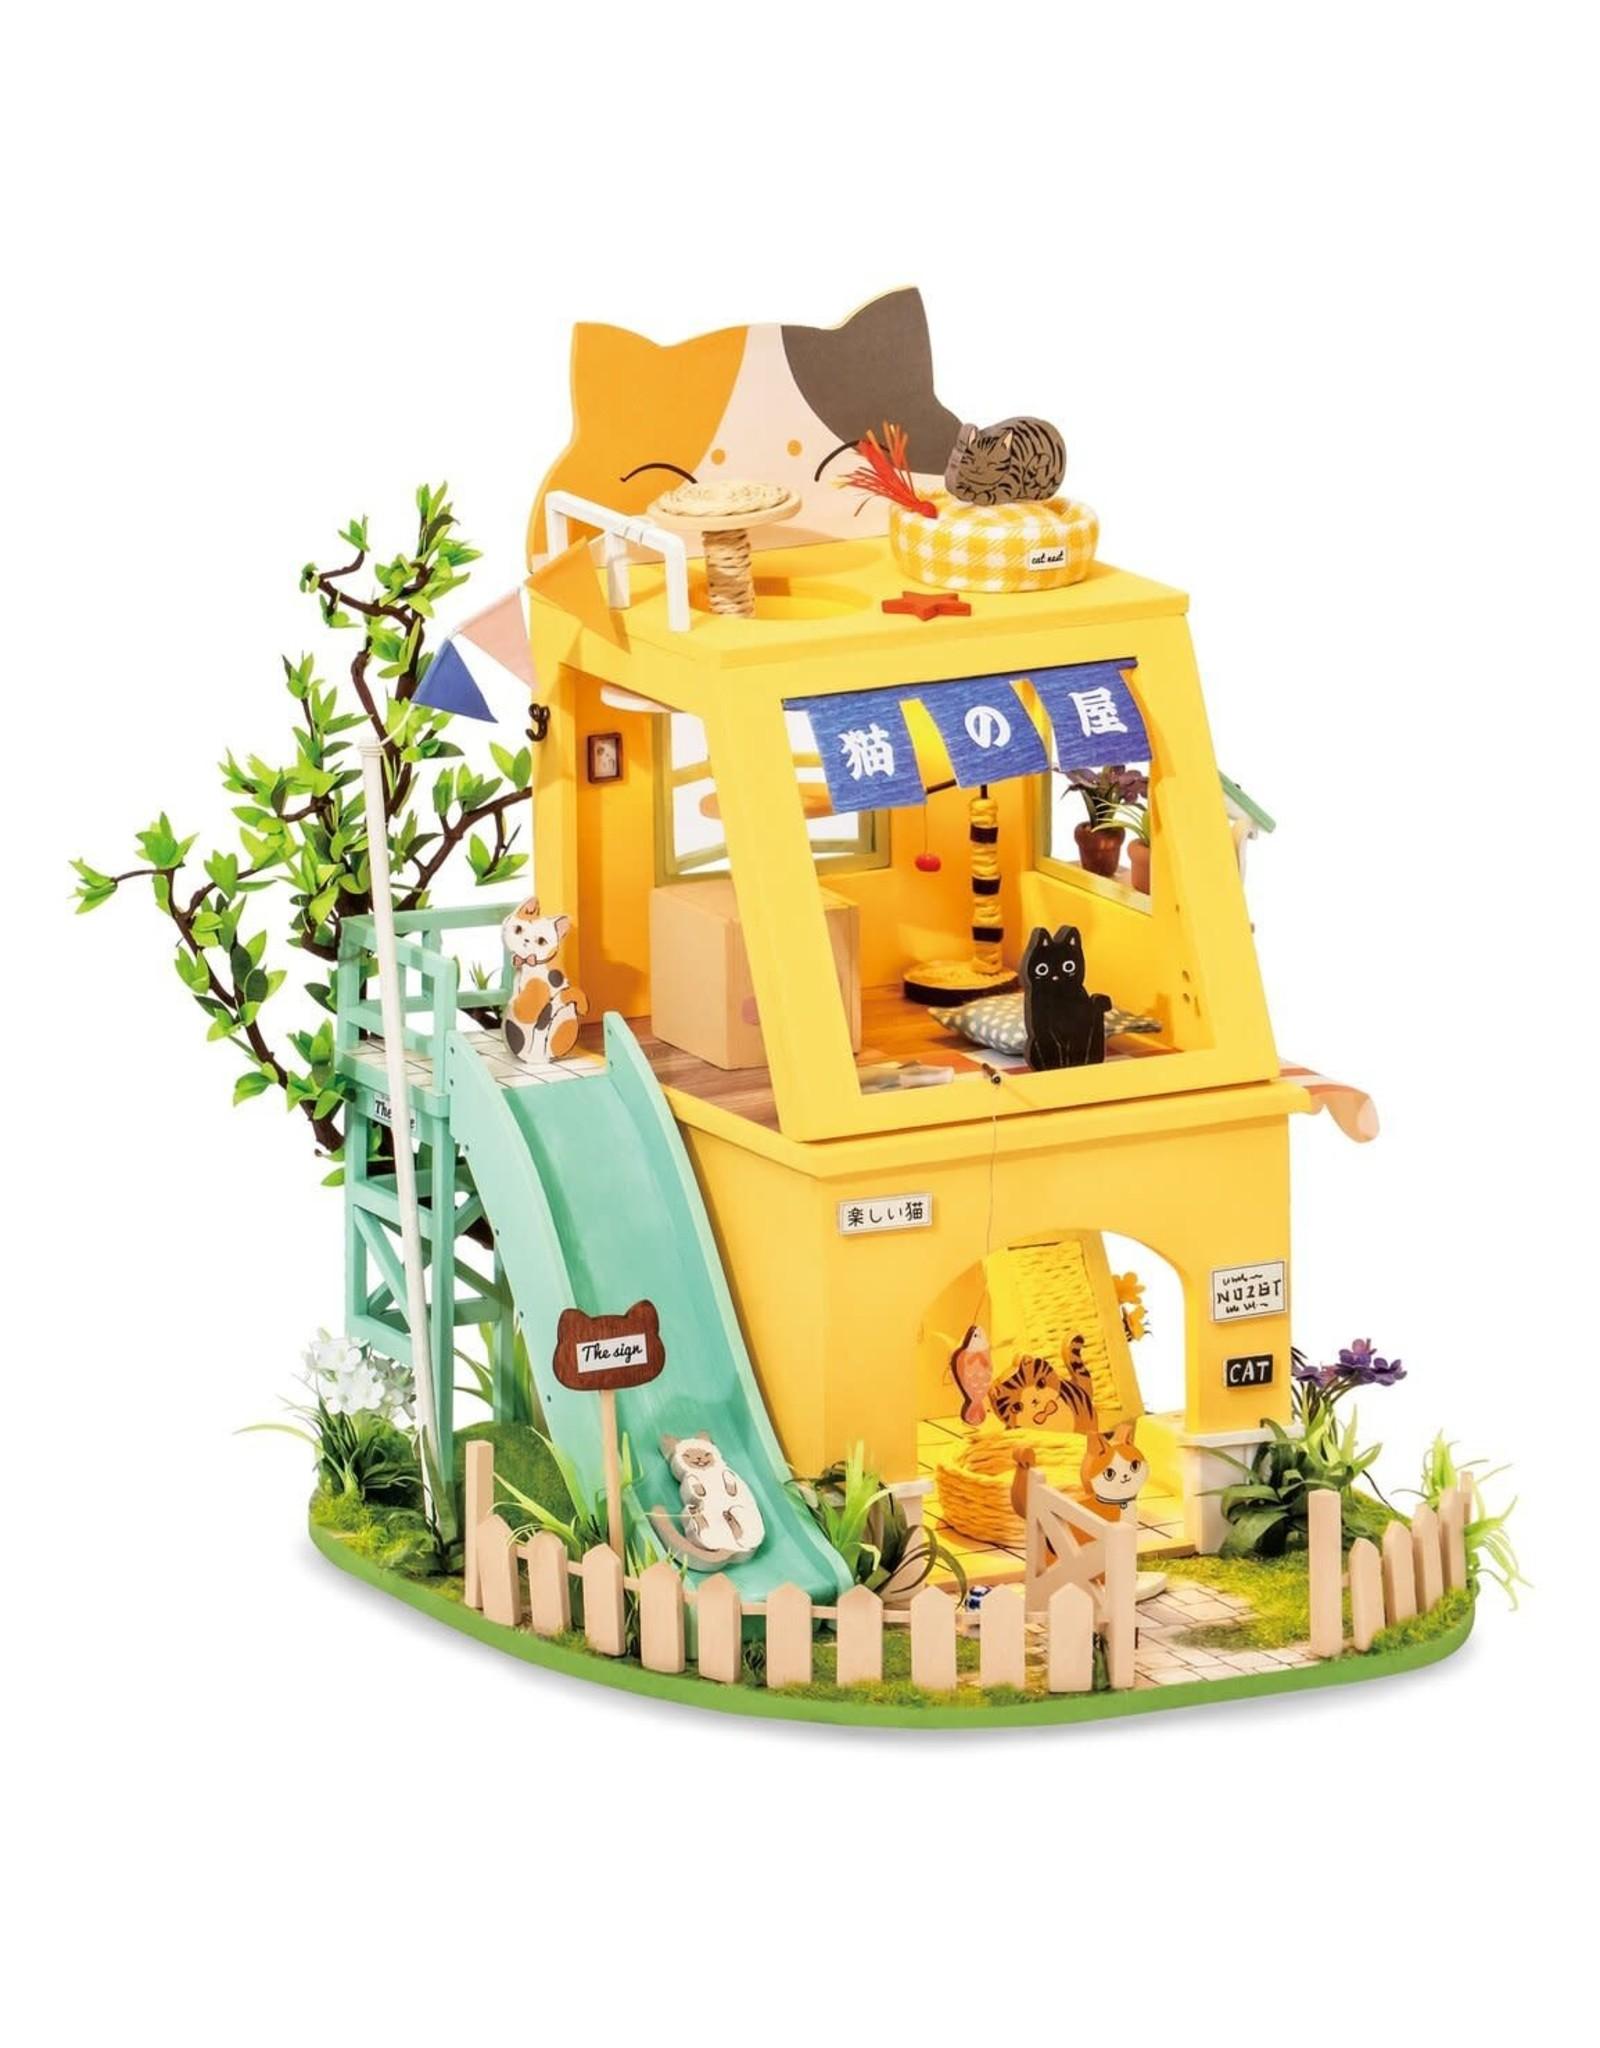 Hands Craft DIY Miniature Dollhouse Kit, Cat House